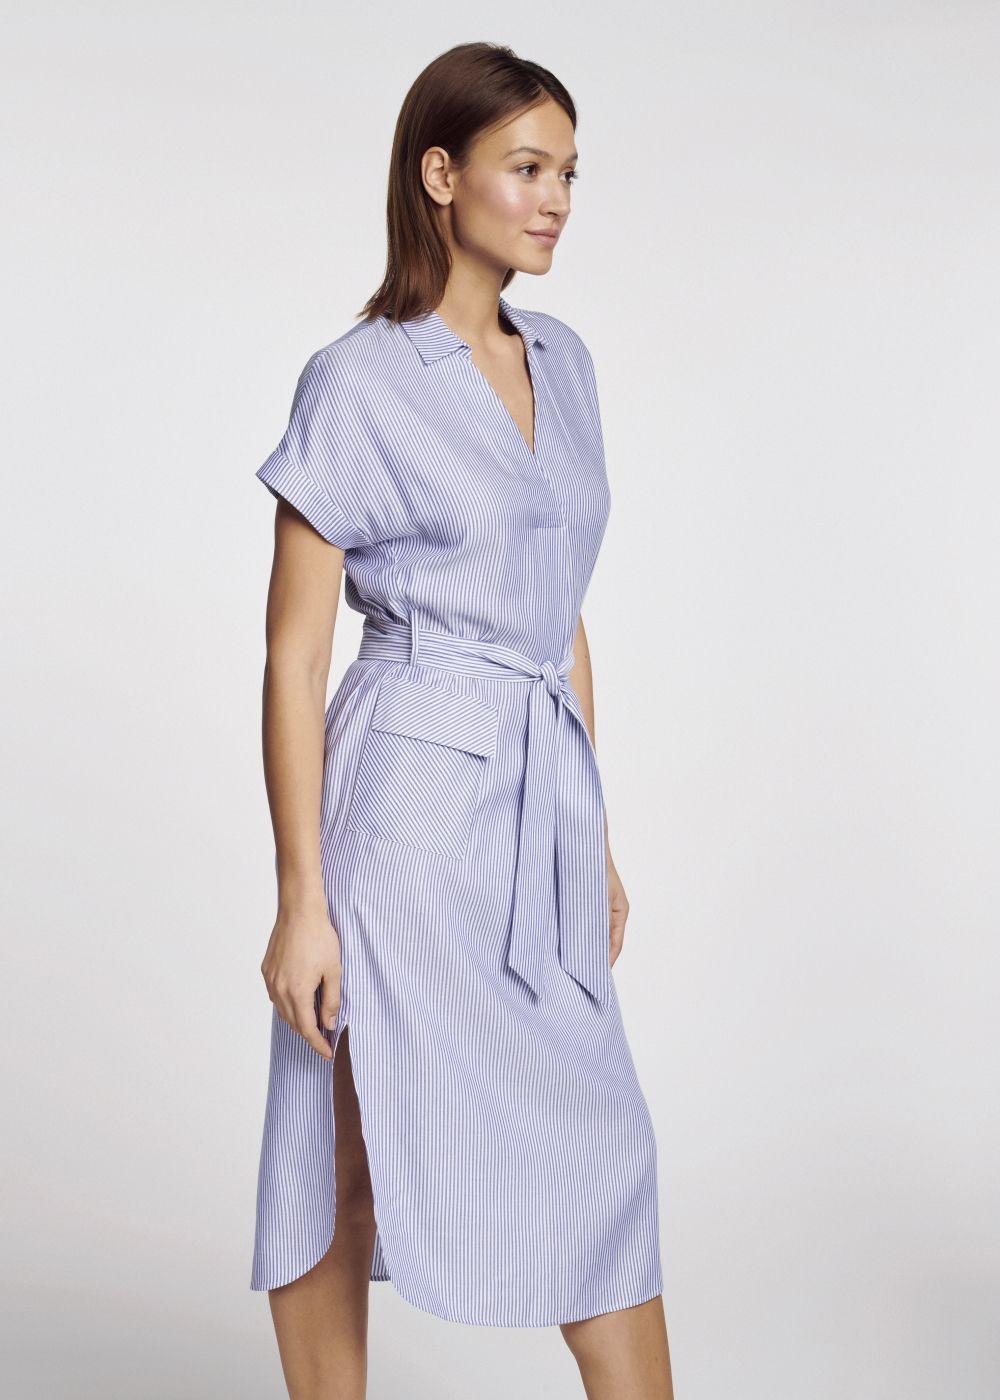 Sukienka damska SUKDT-0090-61(W21)